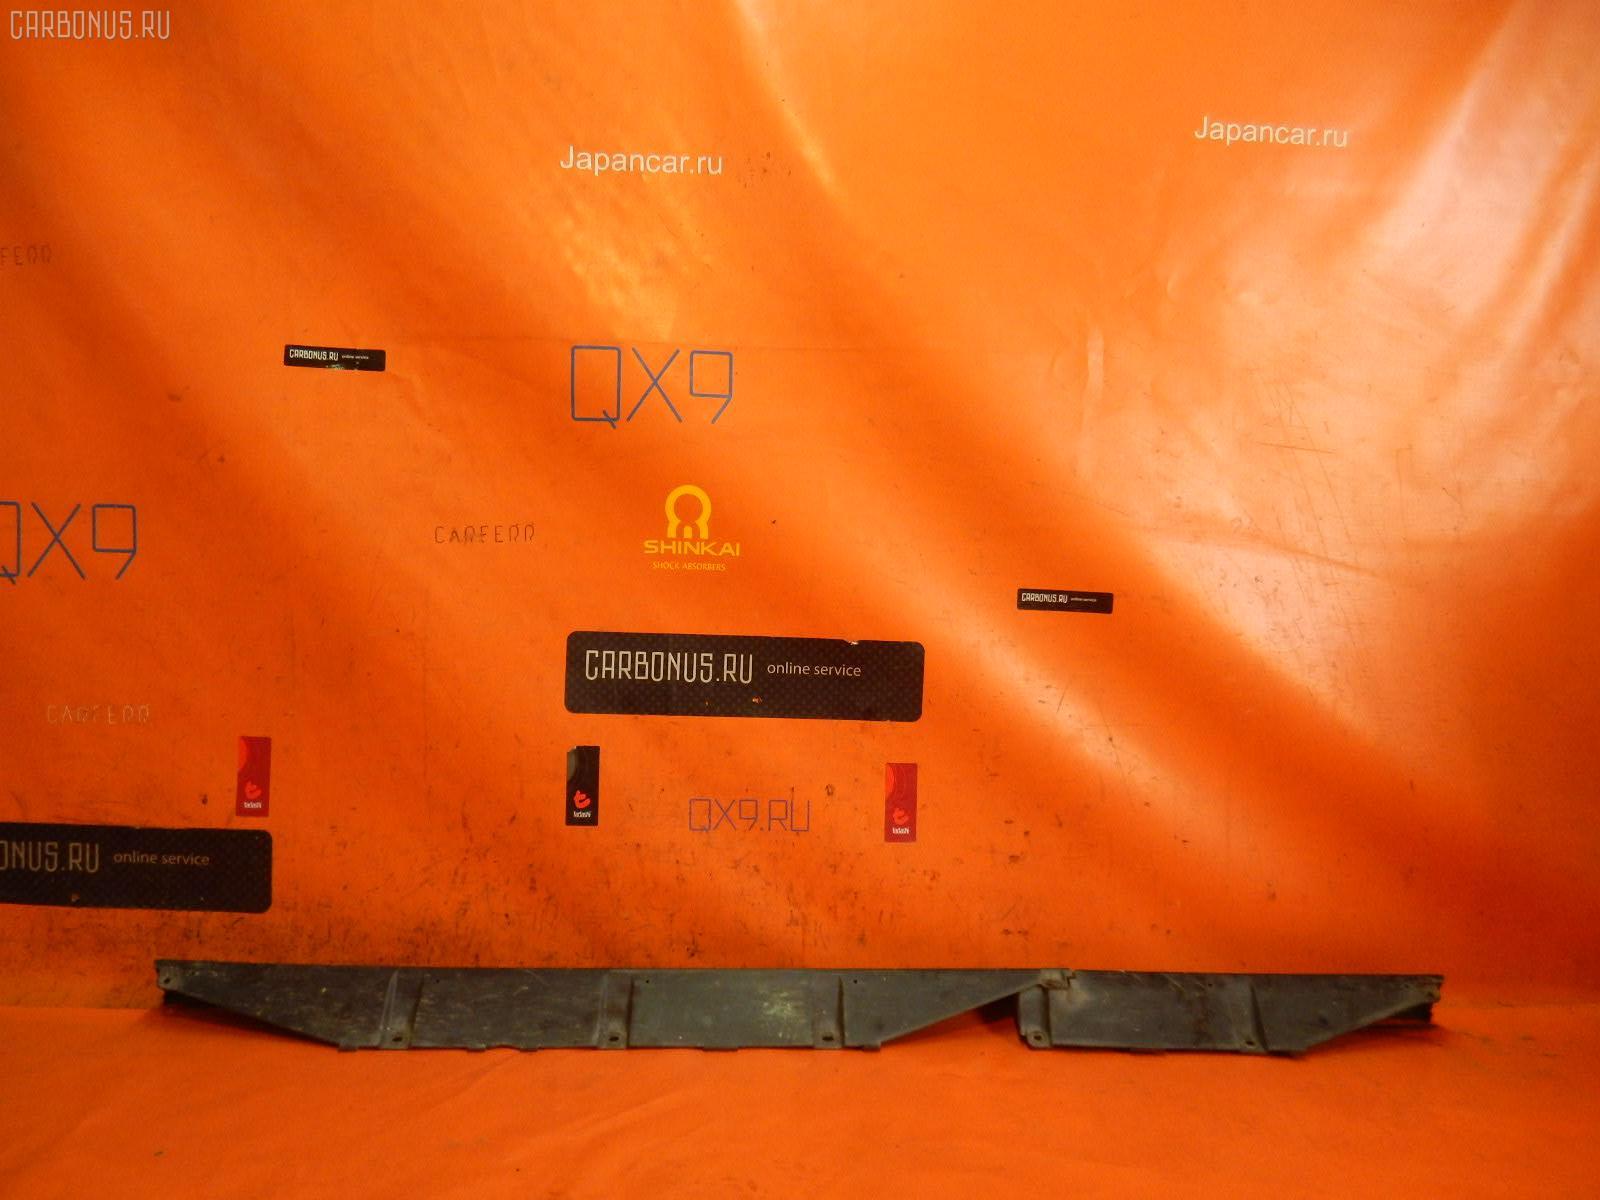 Порог кузова пластиковый ( обвес ) MAZDA LAPUTA HP22S Фото 3